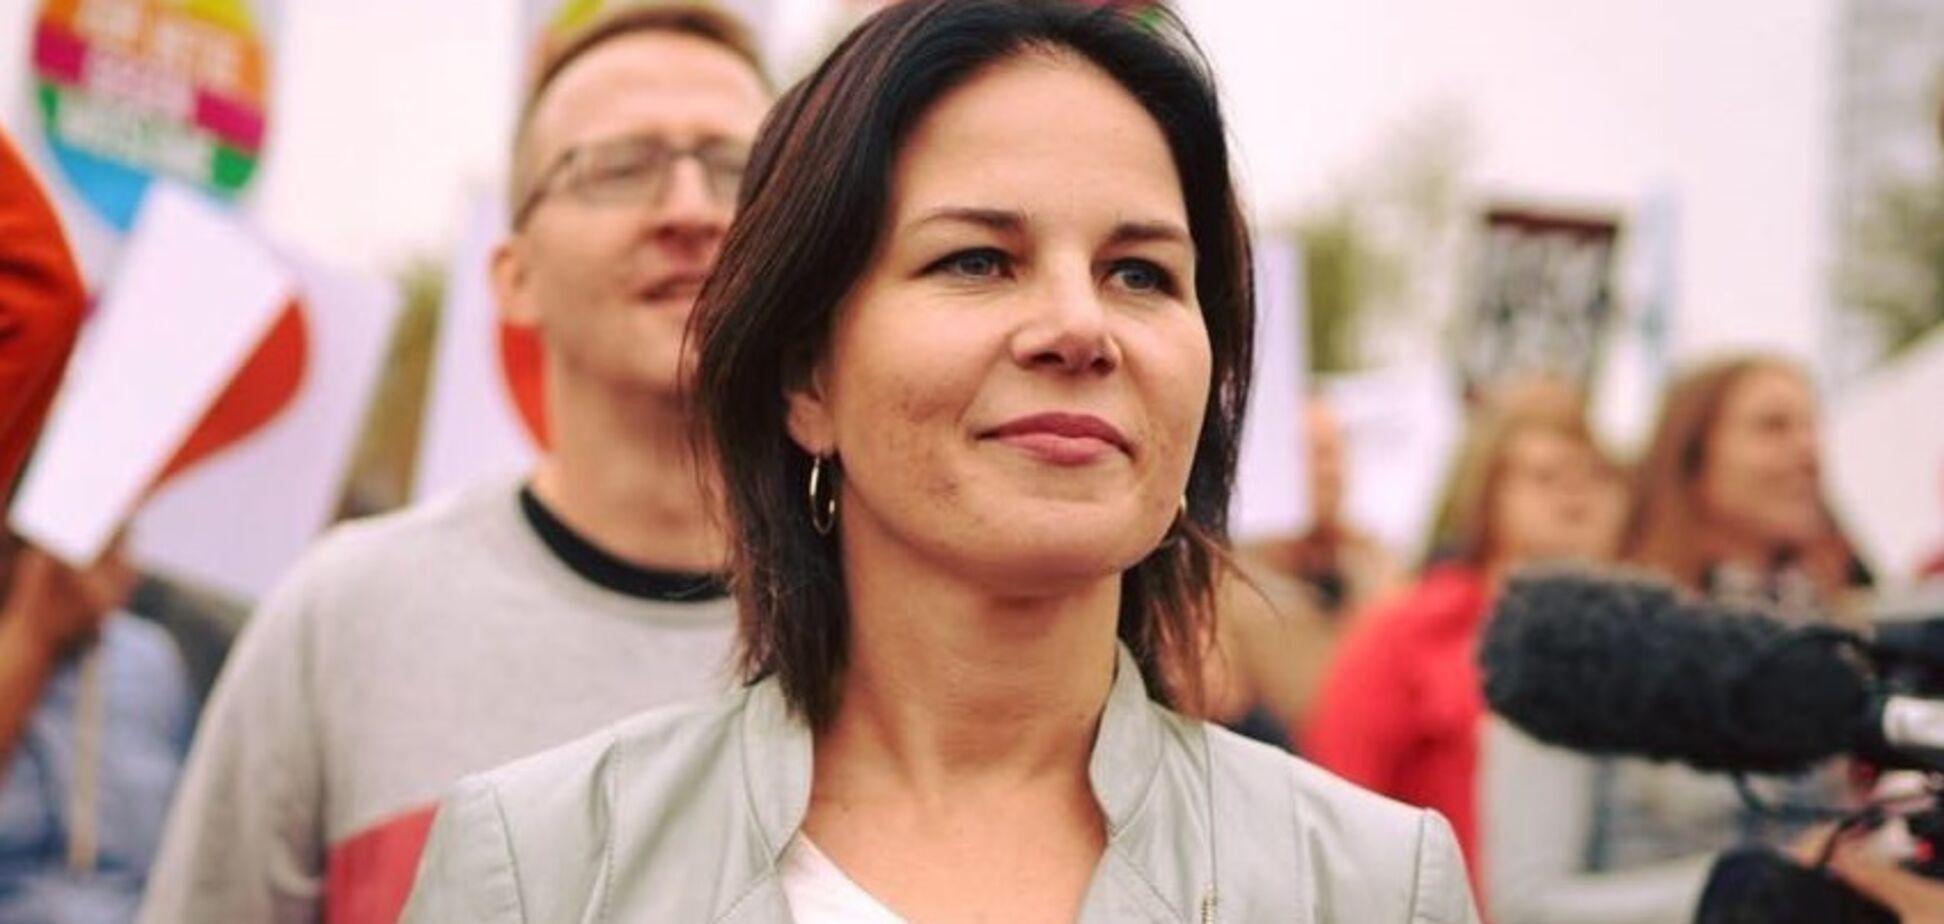 Говорити про членство України в НАТО зараз недоречно, – кандидатка у канцлери ФРН